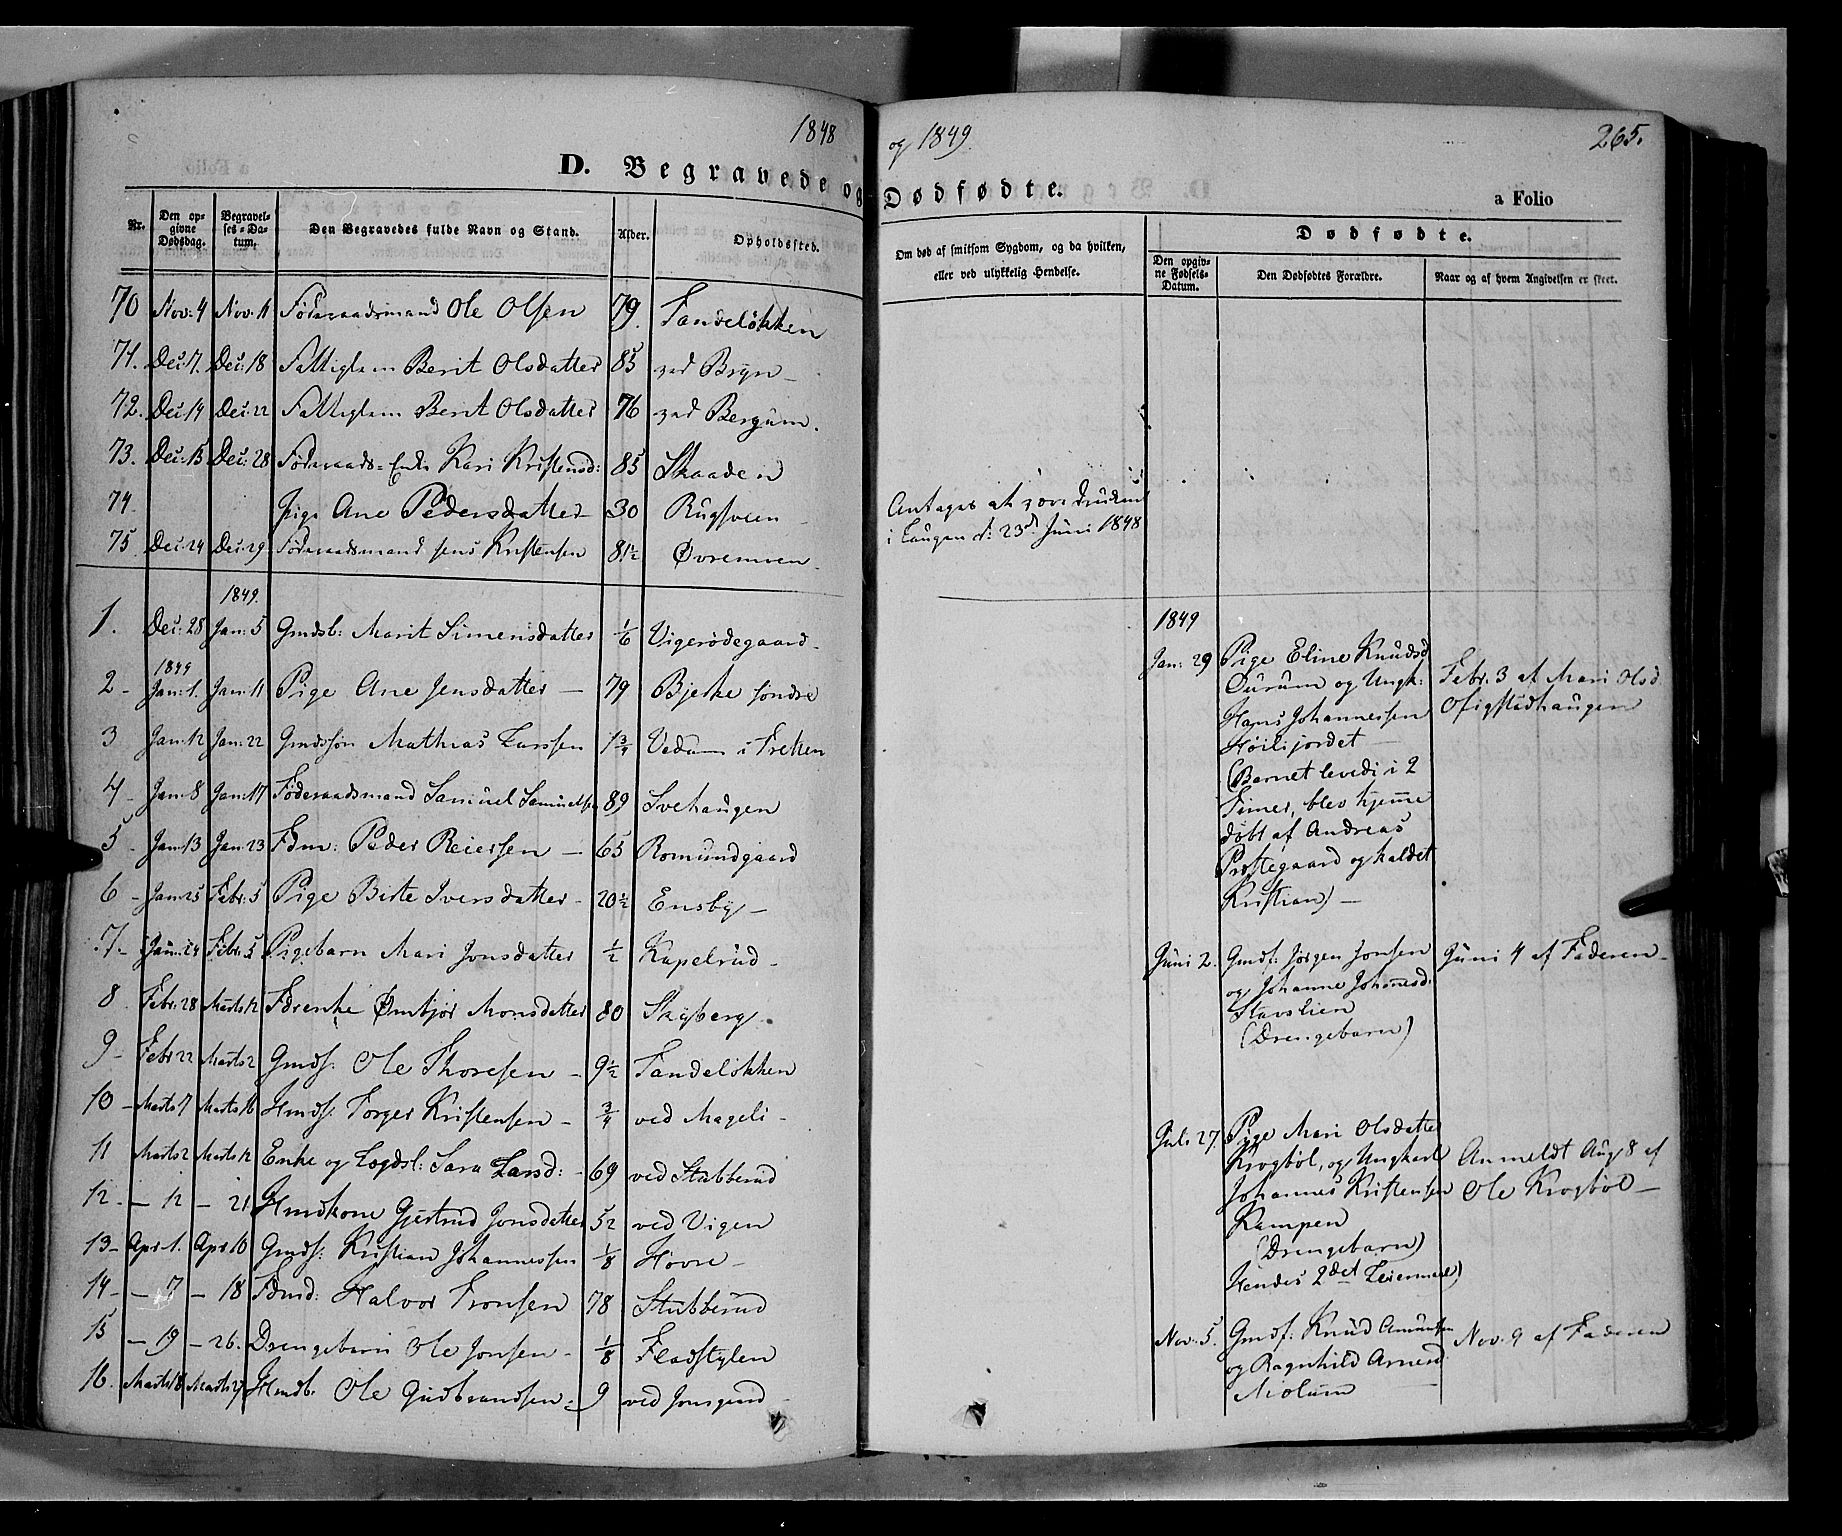 SAH, Øyer prestekontor, Ministerialbok nr. 5, 1842-1857, s. 265